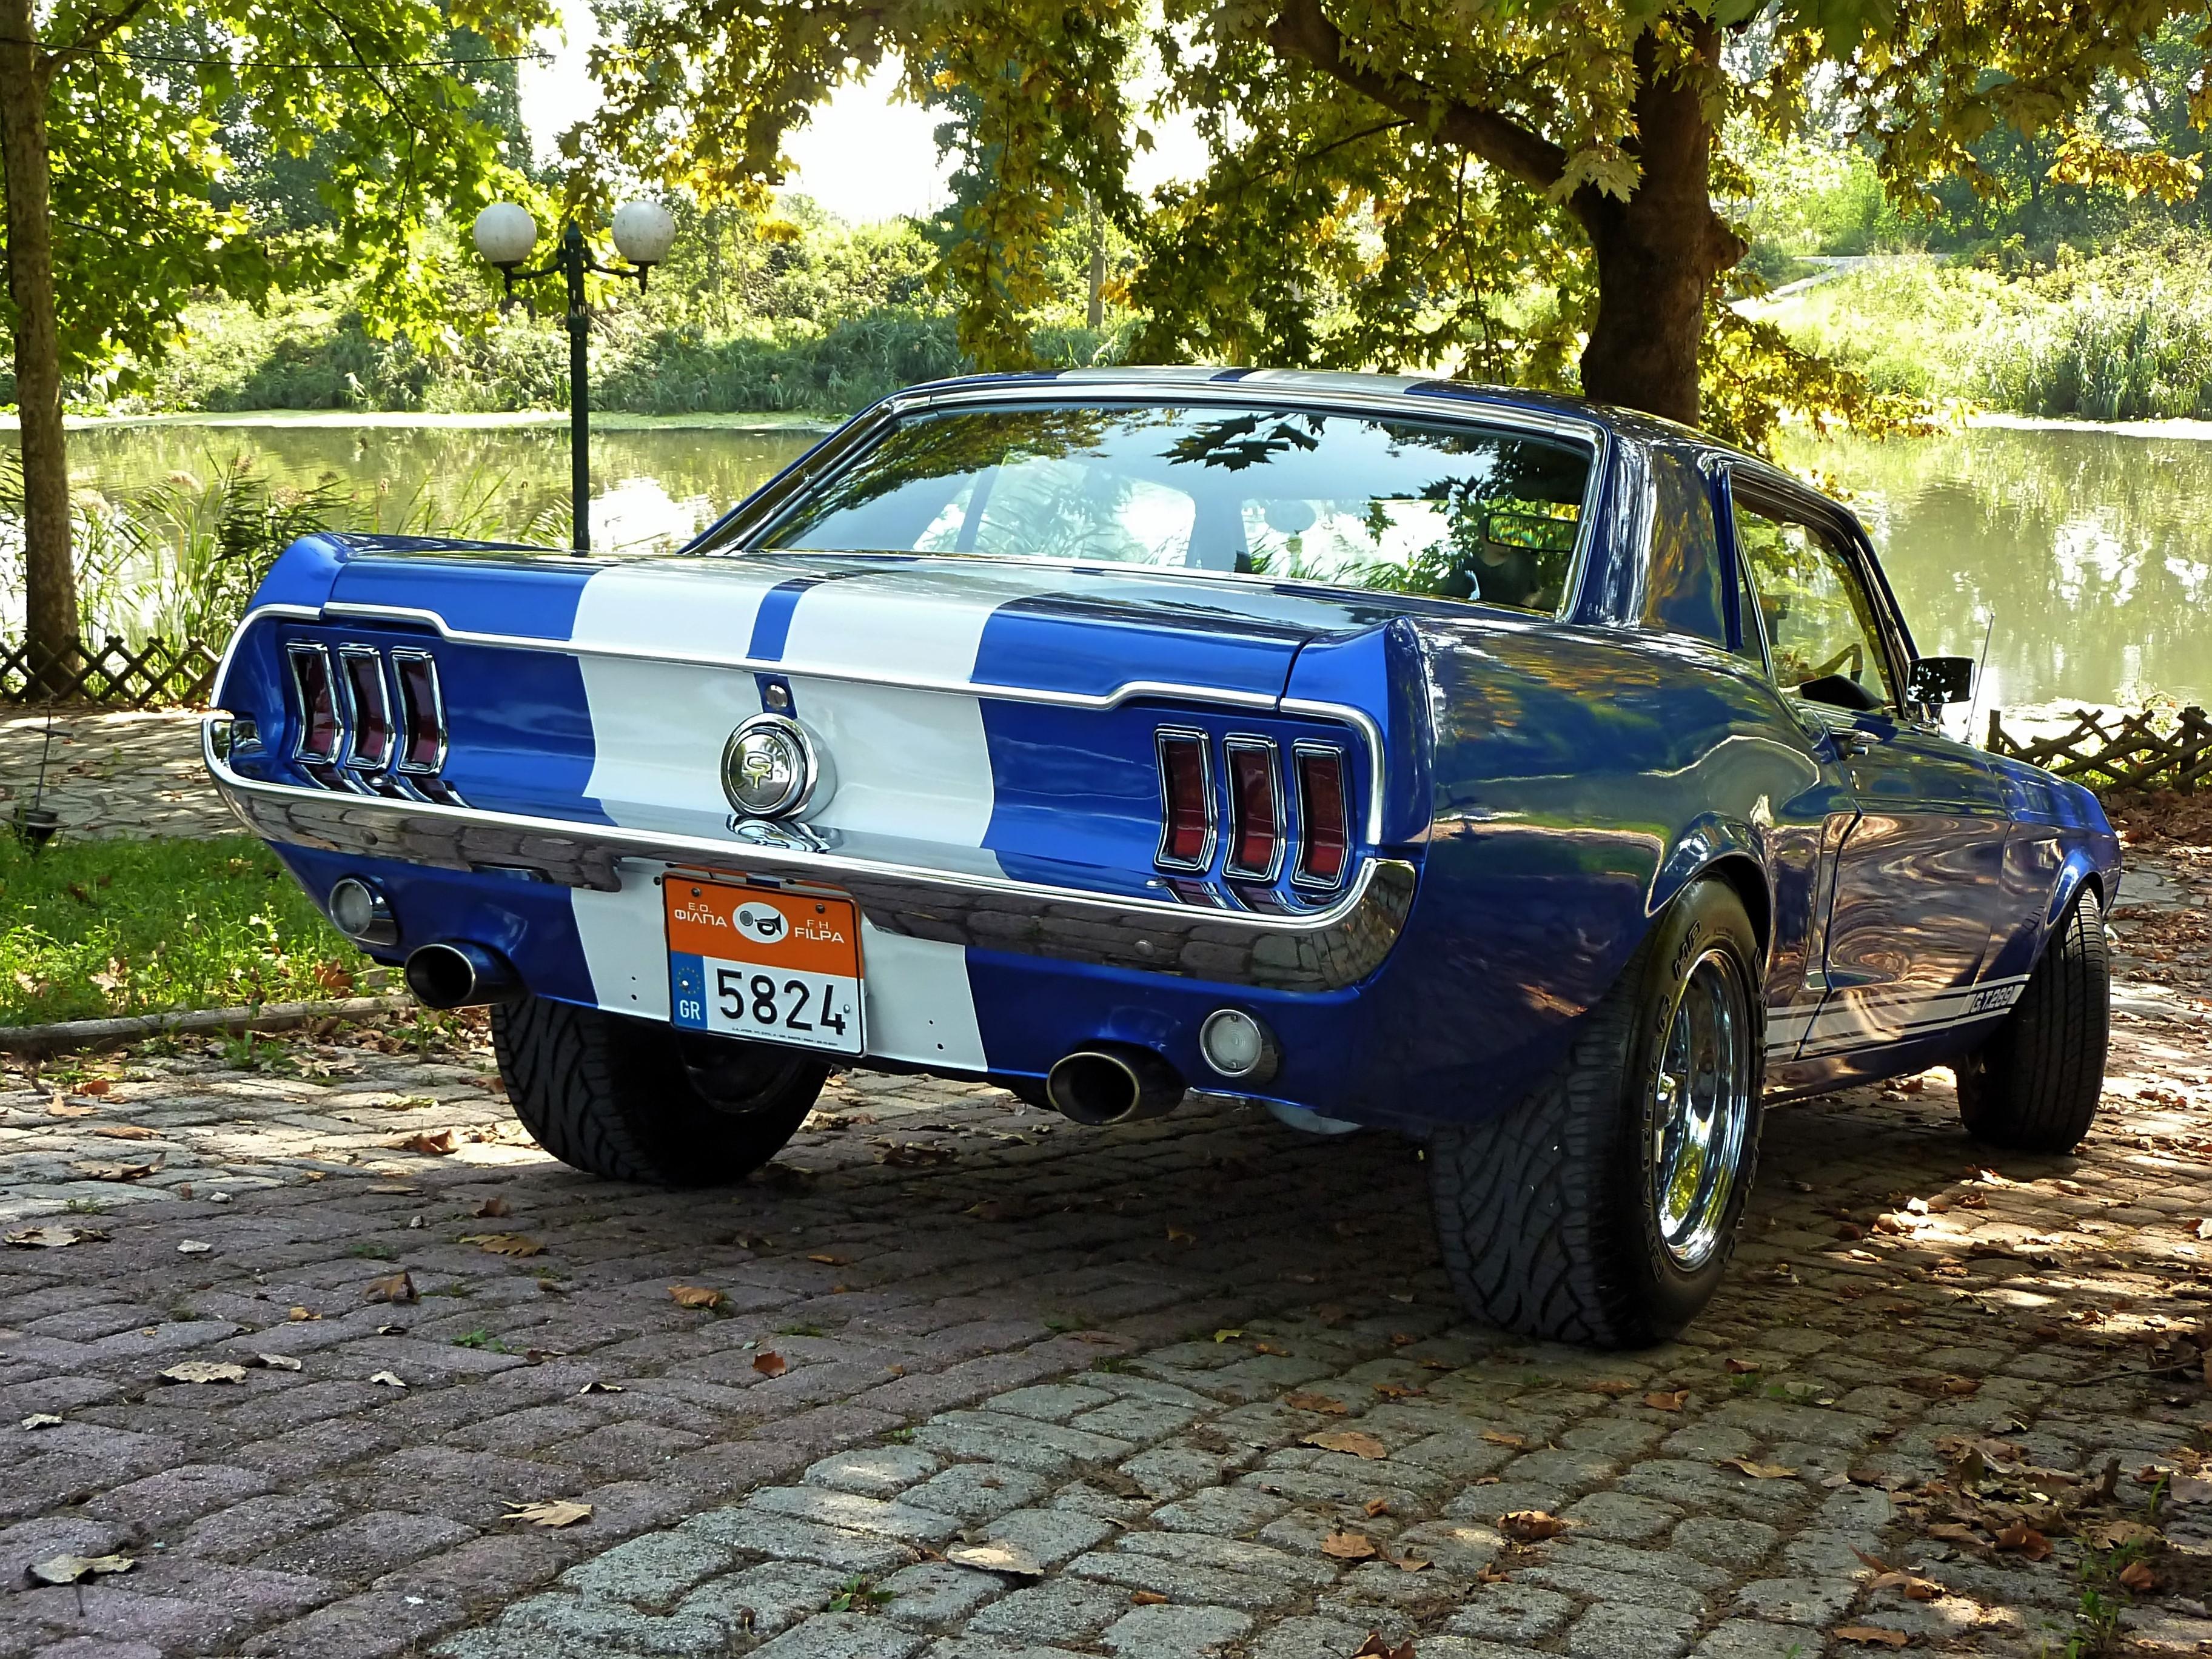 1968 Ford Mustang 289 (58).jpg